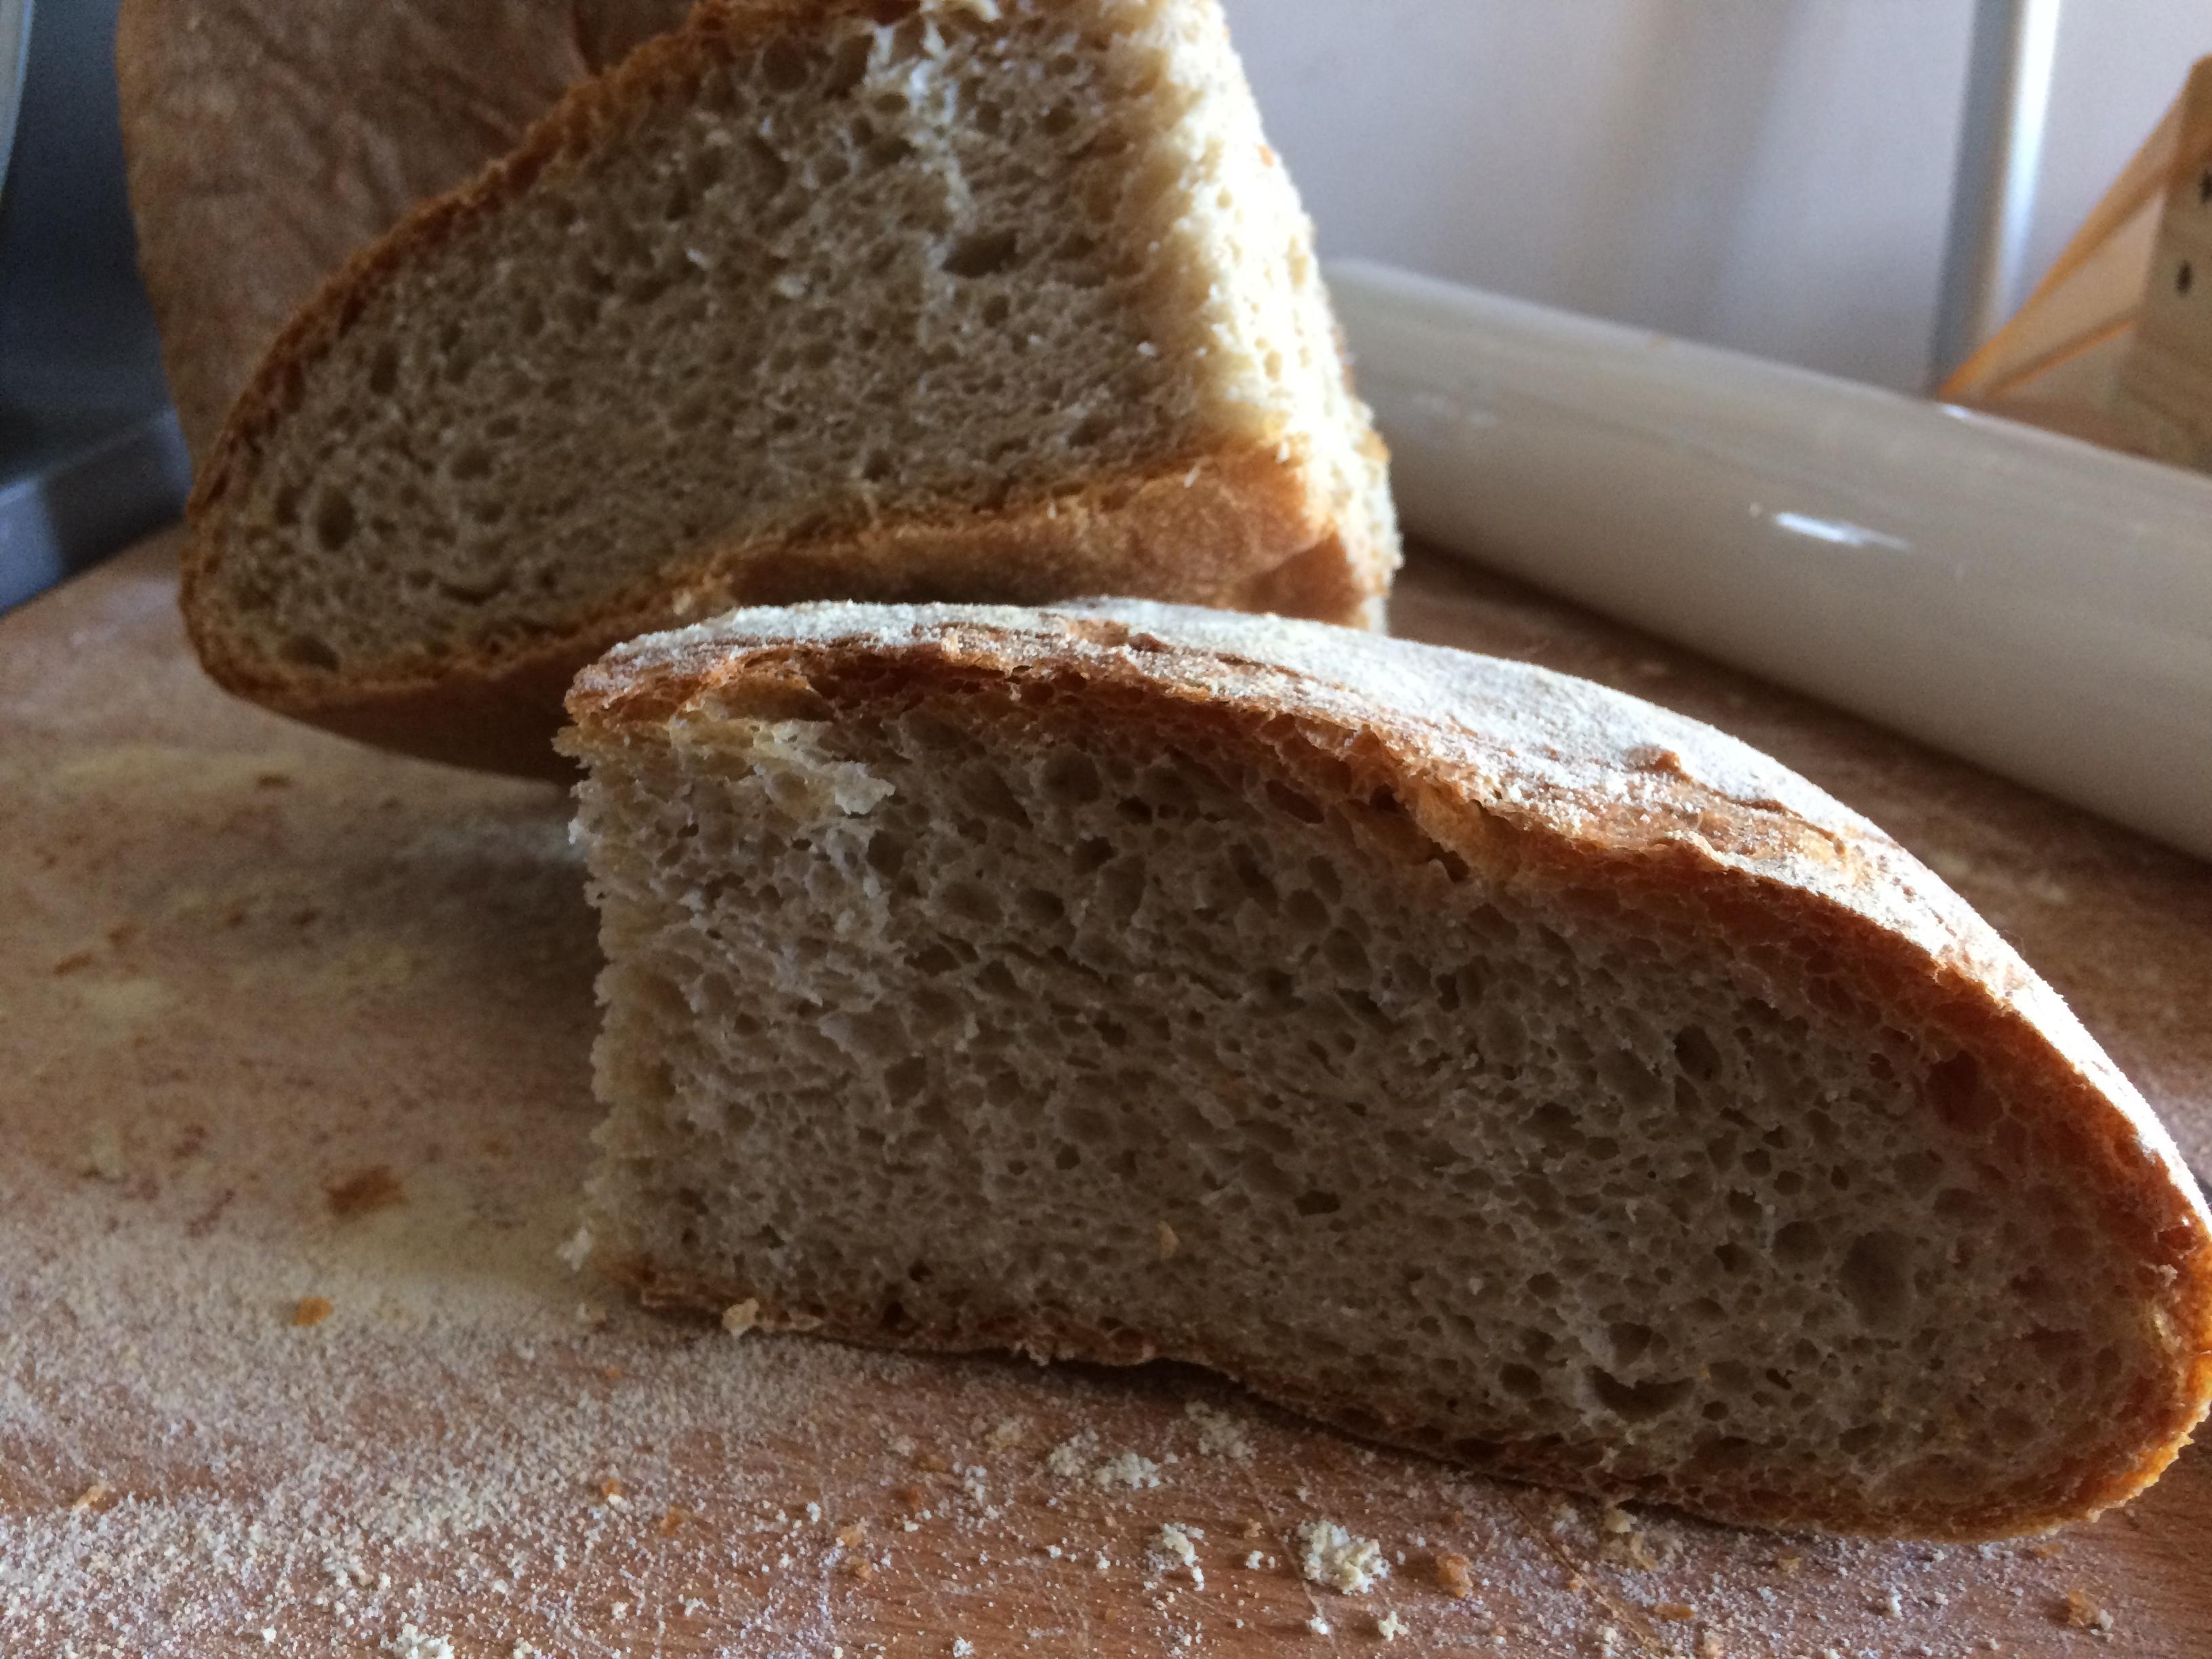 Il pane, come piace a me